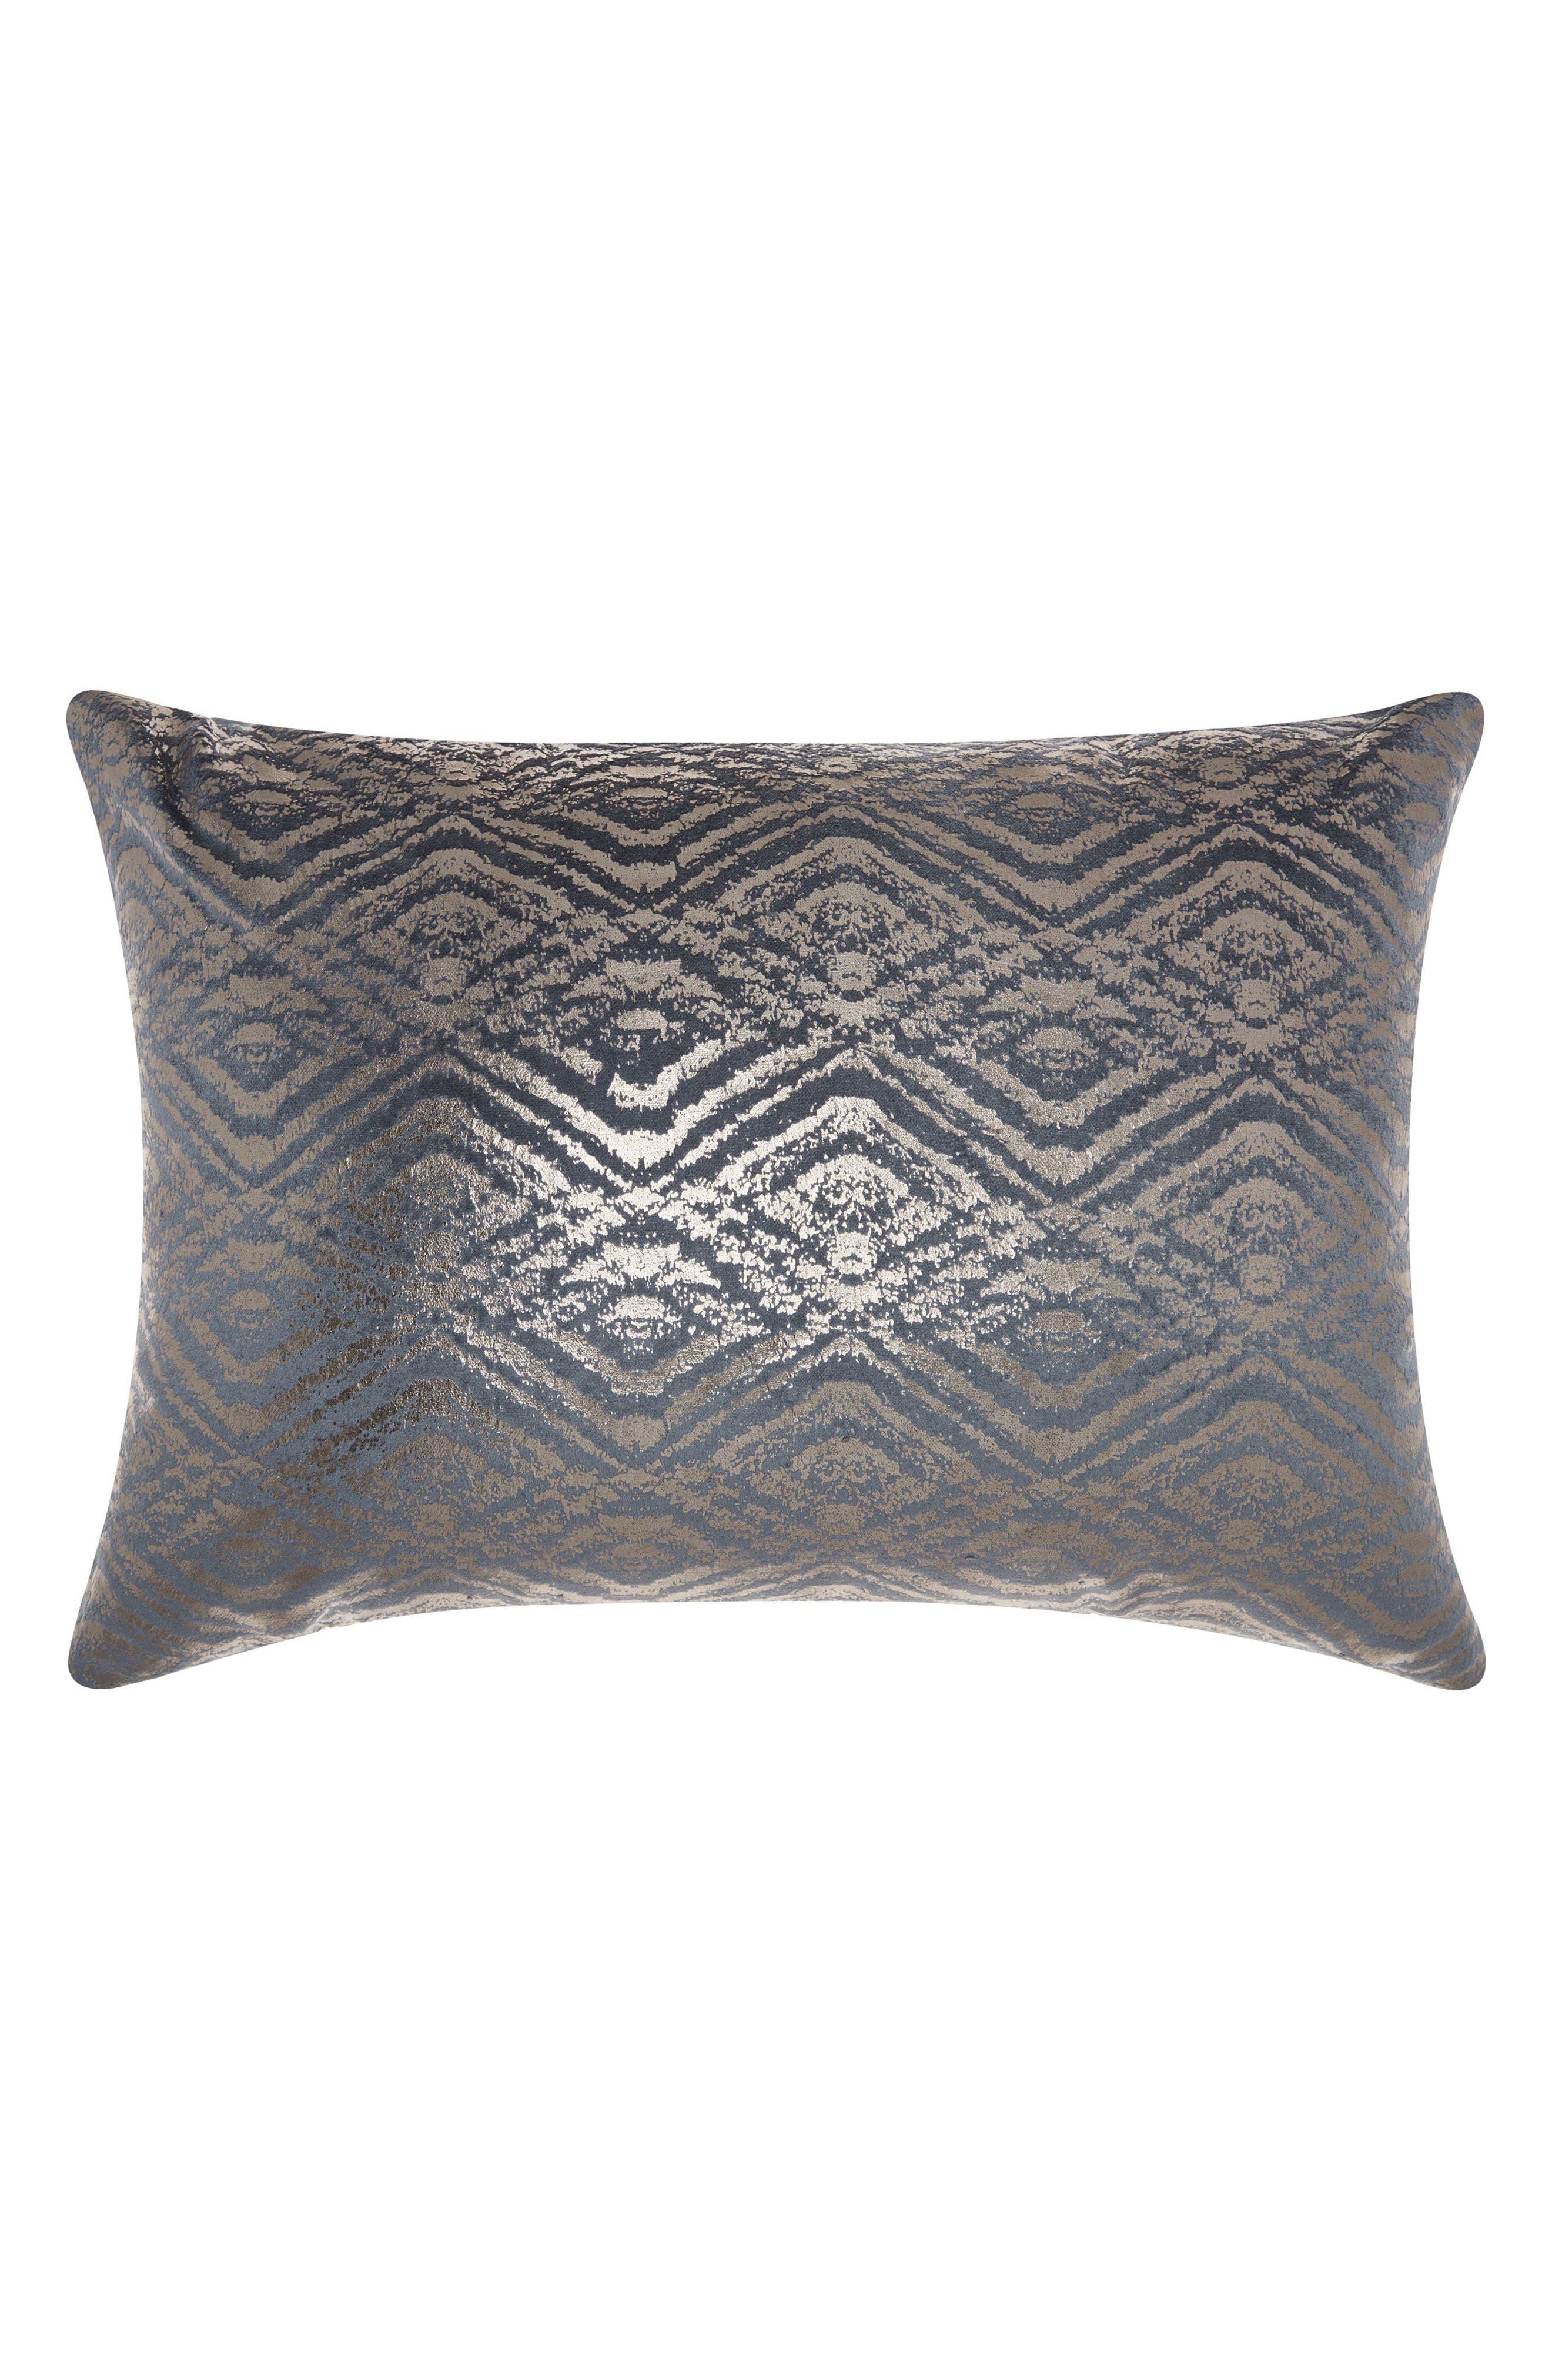 Main Image - Mina Victory Metallic Diamonds Accent Pillow